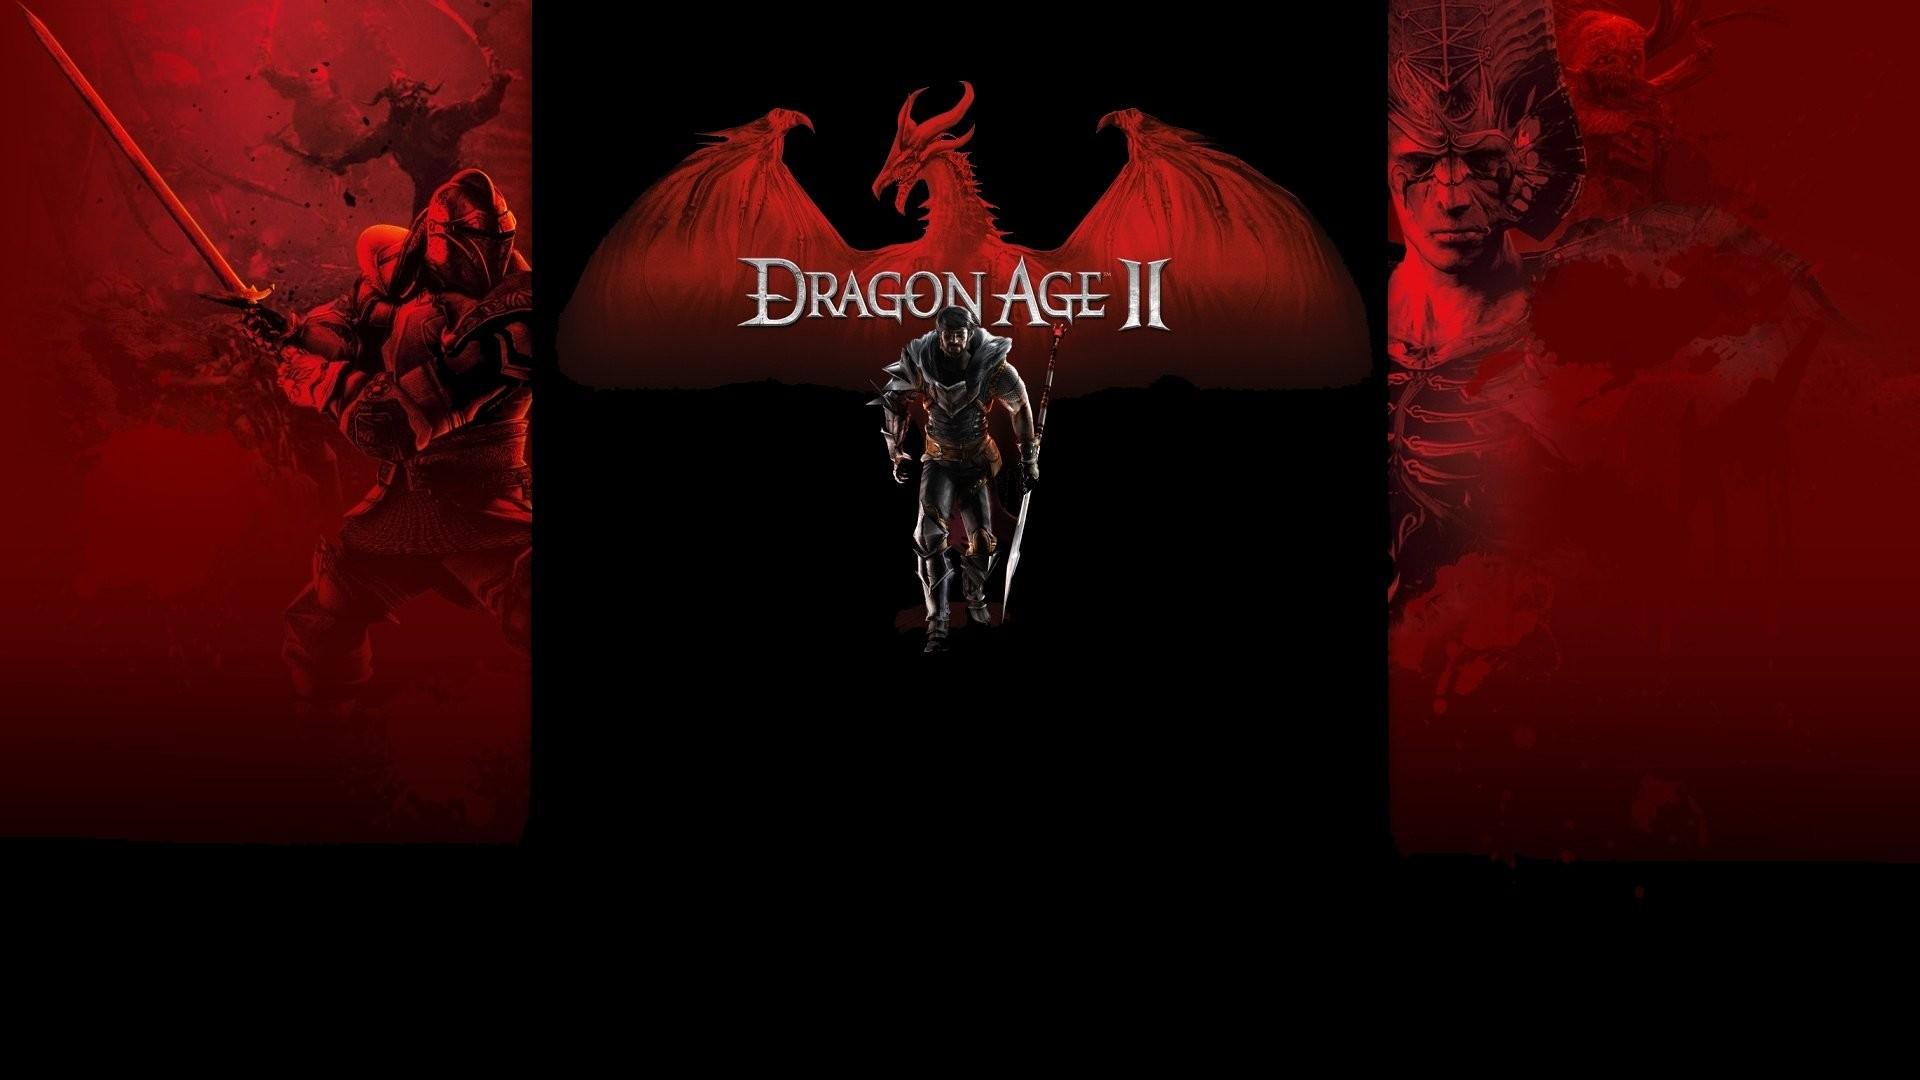 11 HD Dragon Age II Desktop Wallpapers For Free Download